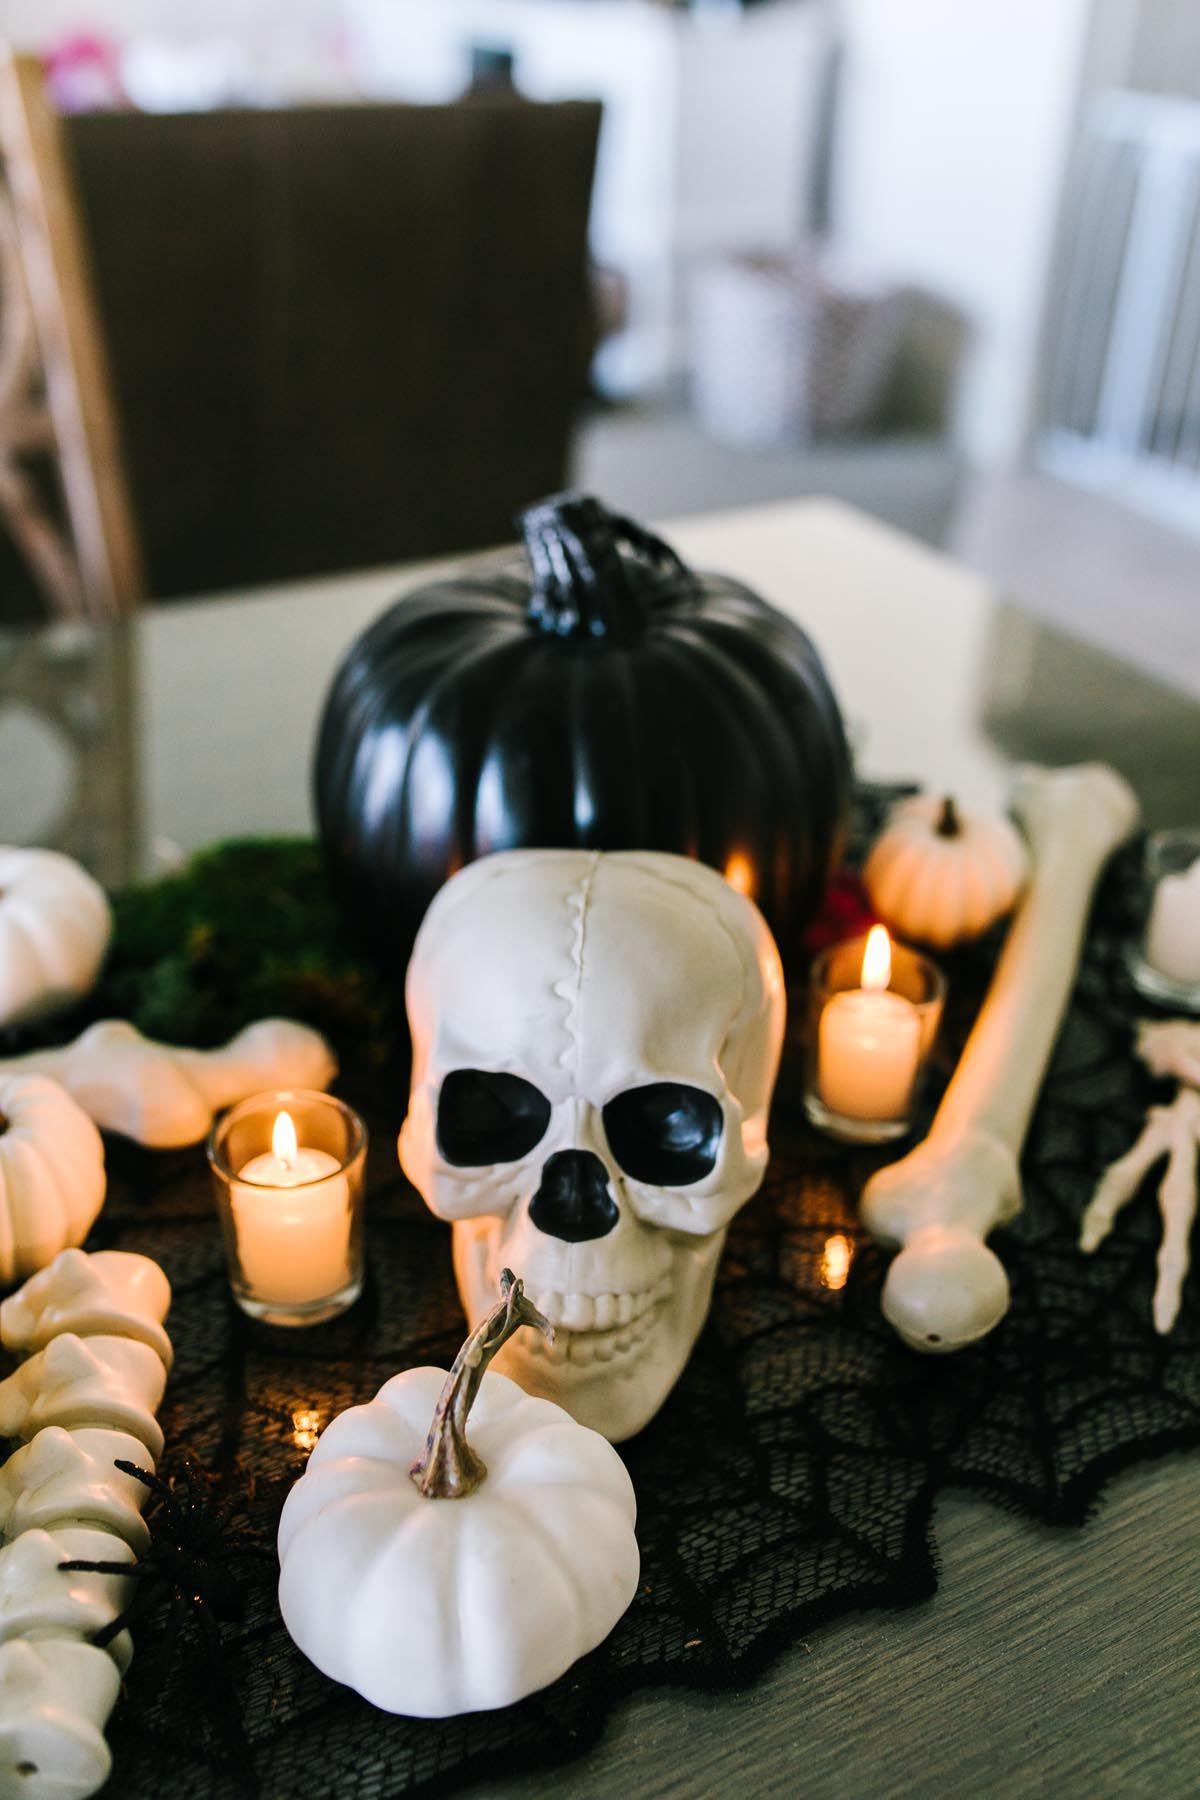 spooky halloween decorations - HD1200×1800